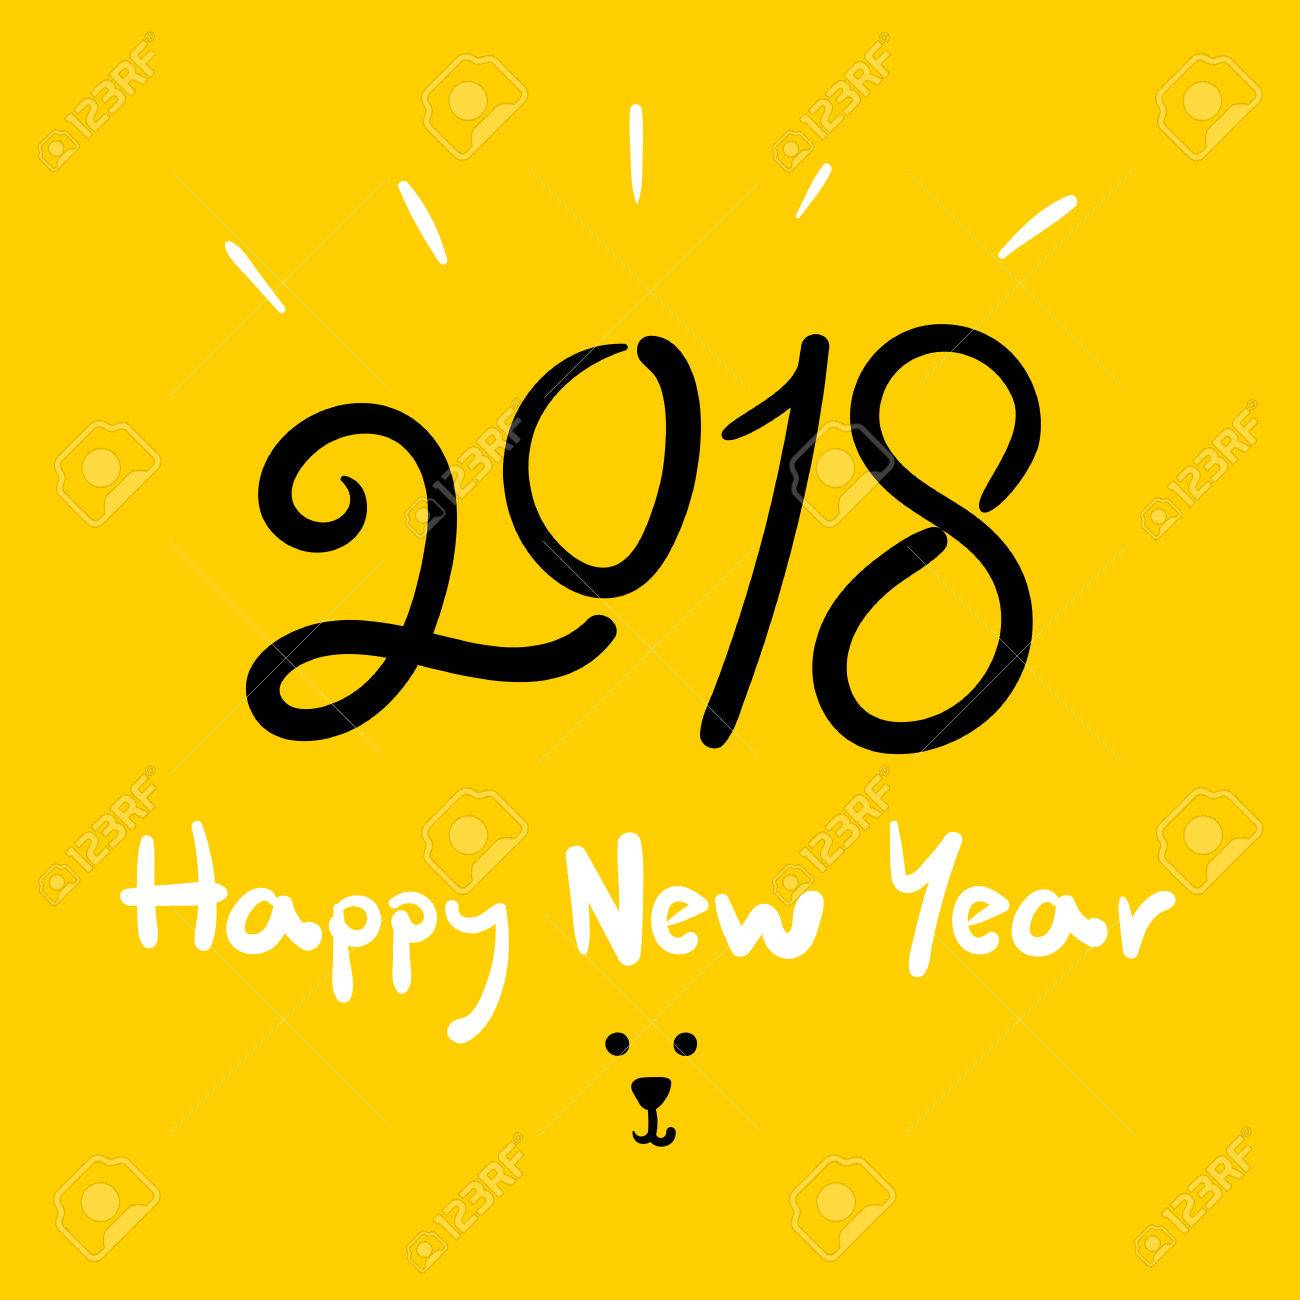 Happy New Year 2018 (Dog Year) Doodle Handwriting Brush On Bright Yellow  Background,